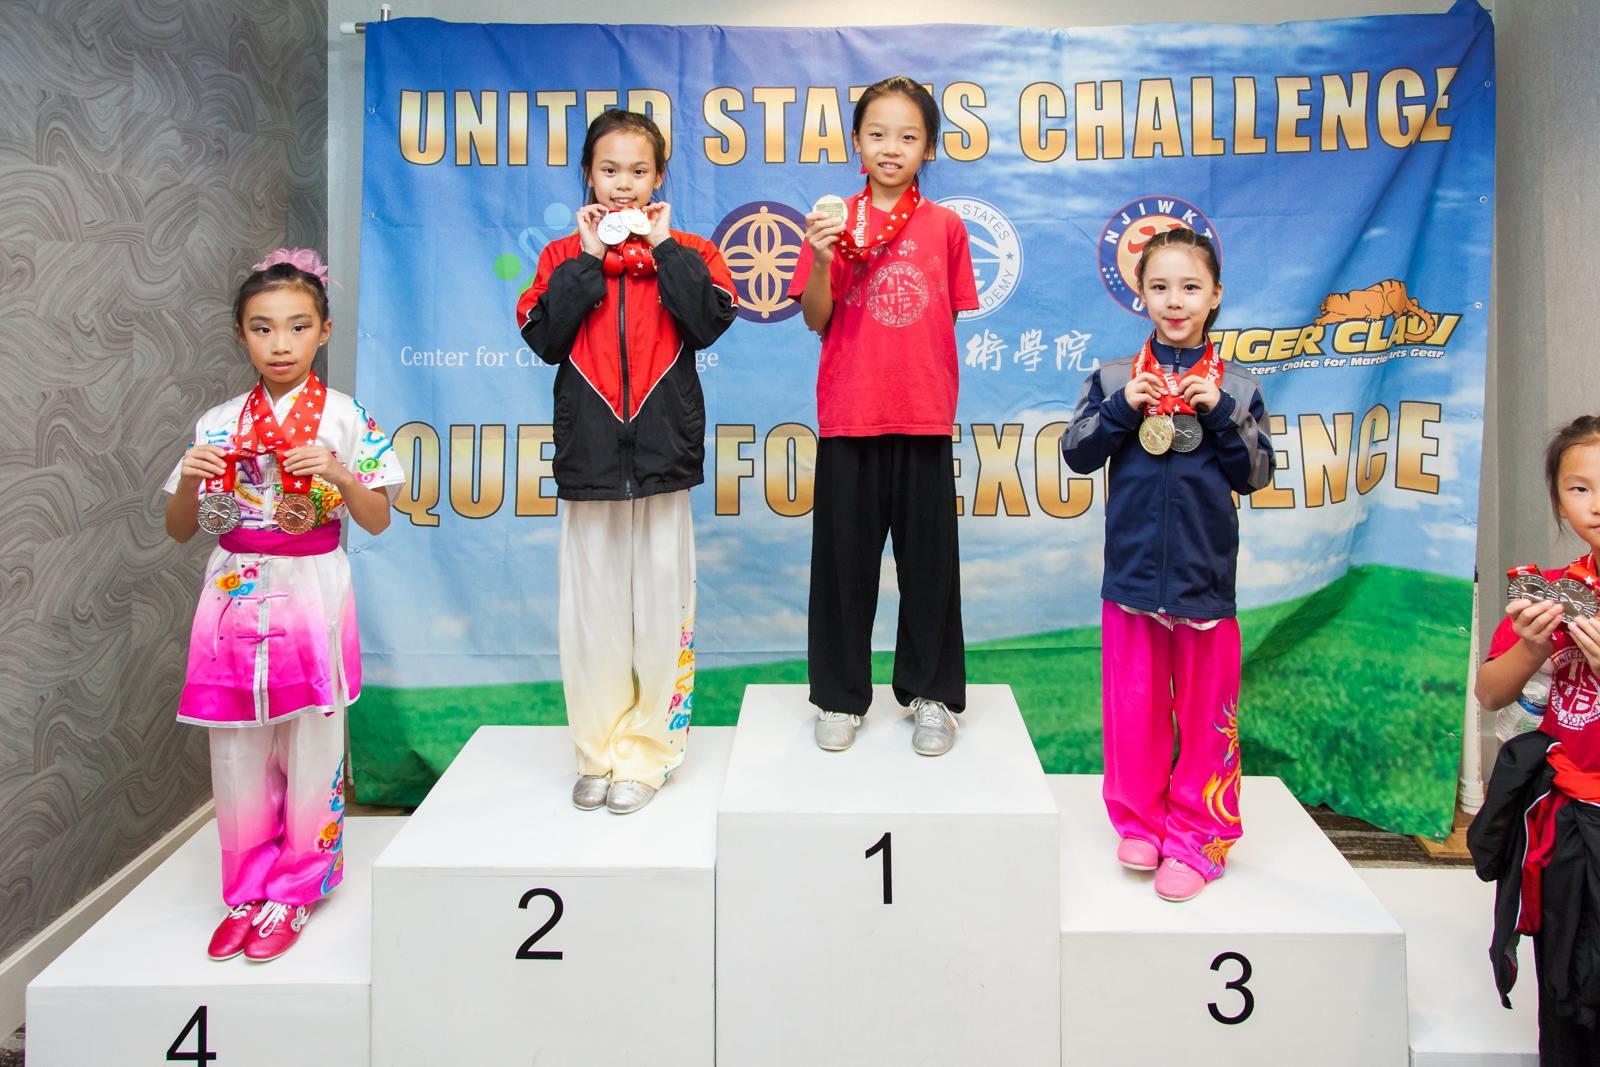 wayland-li-wushu-us-challenge-competition-maryland-2017-48.jpg